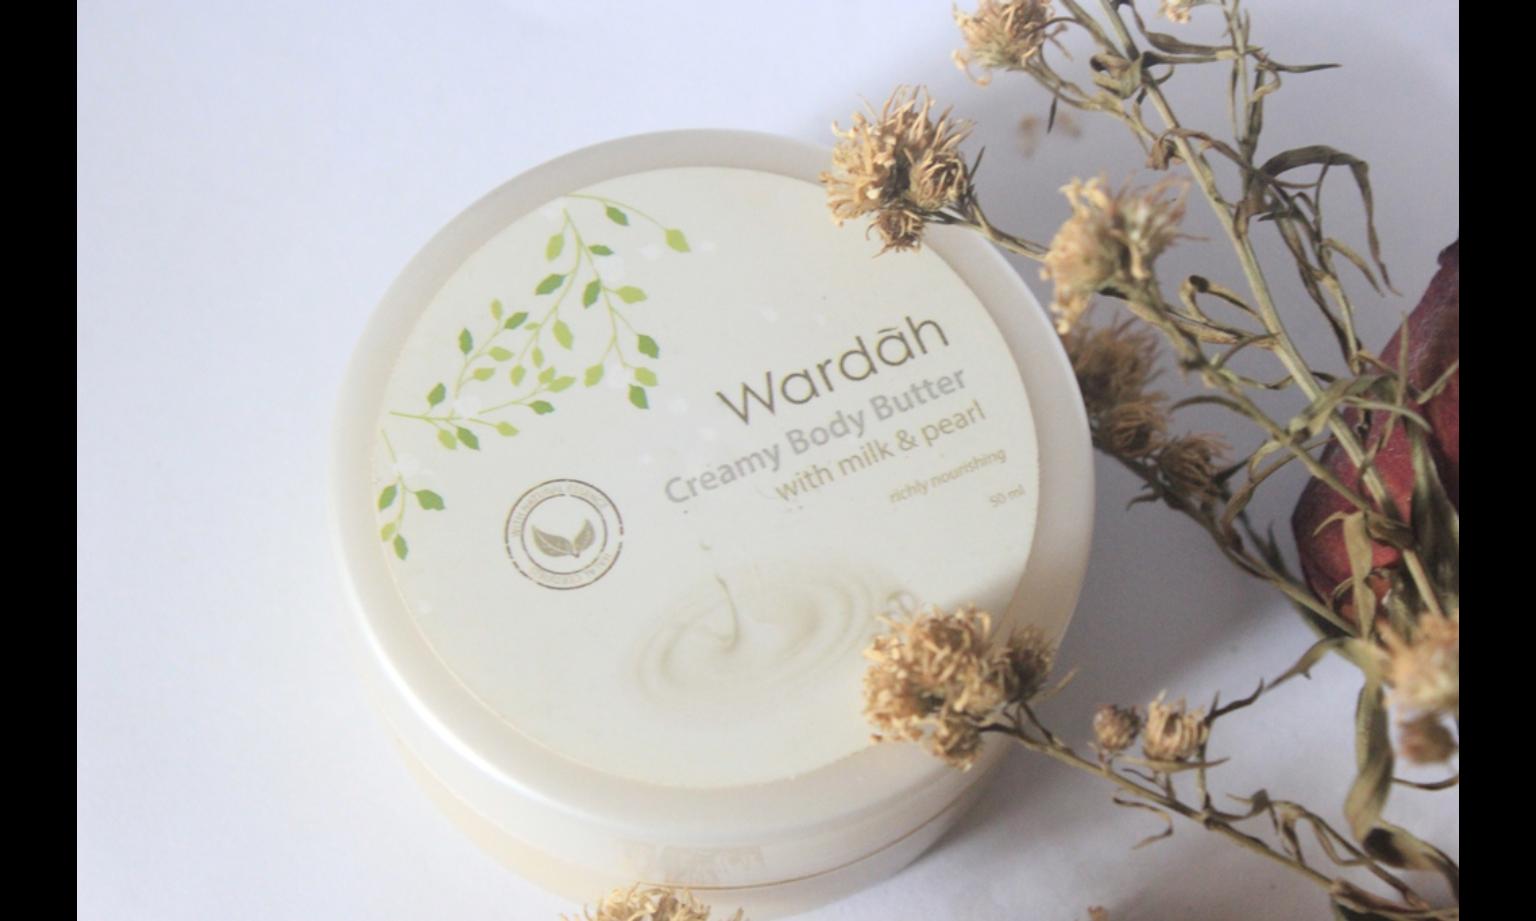 Wardah Creamy Body Butter Milk & Pearl